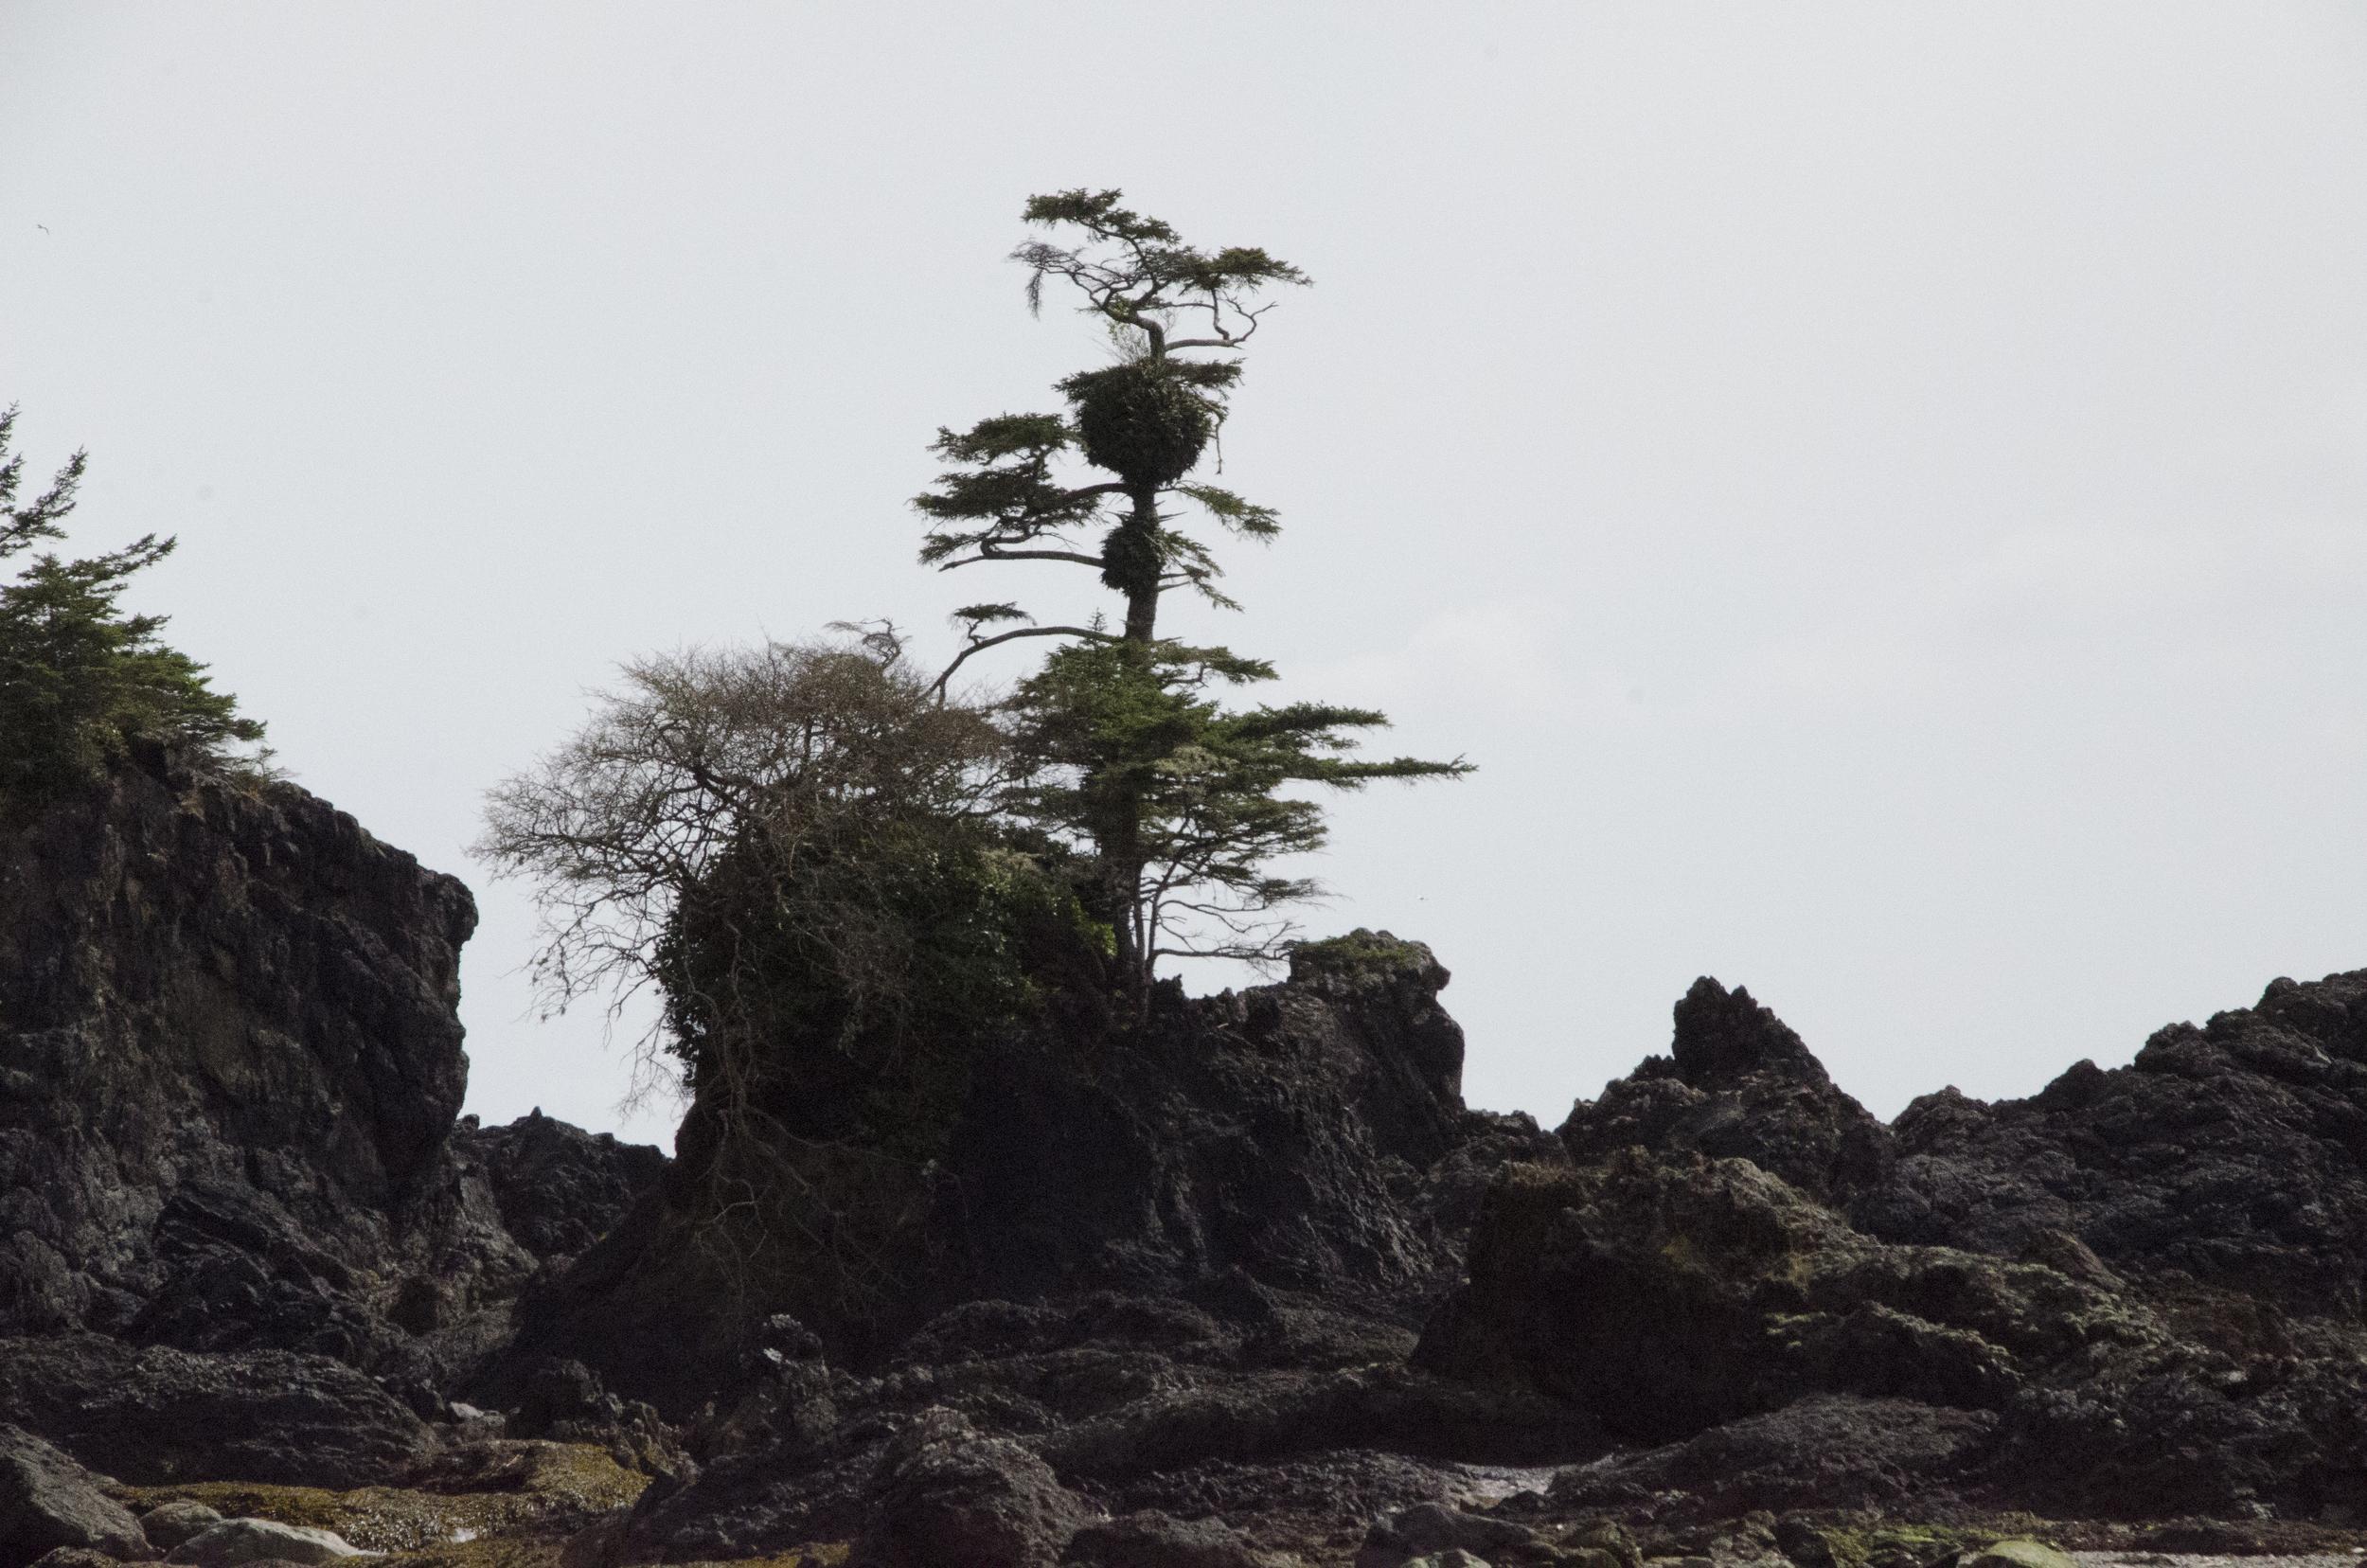 Grandmother's Tree at Spring Cove, Ucluelet, BC. Photo by Katsumi Kimoto